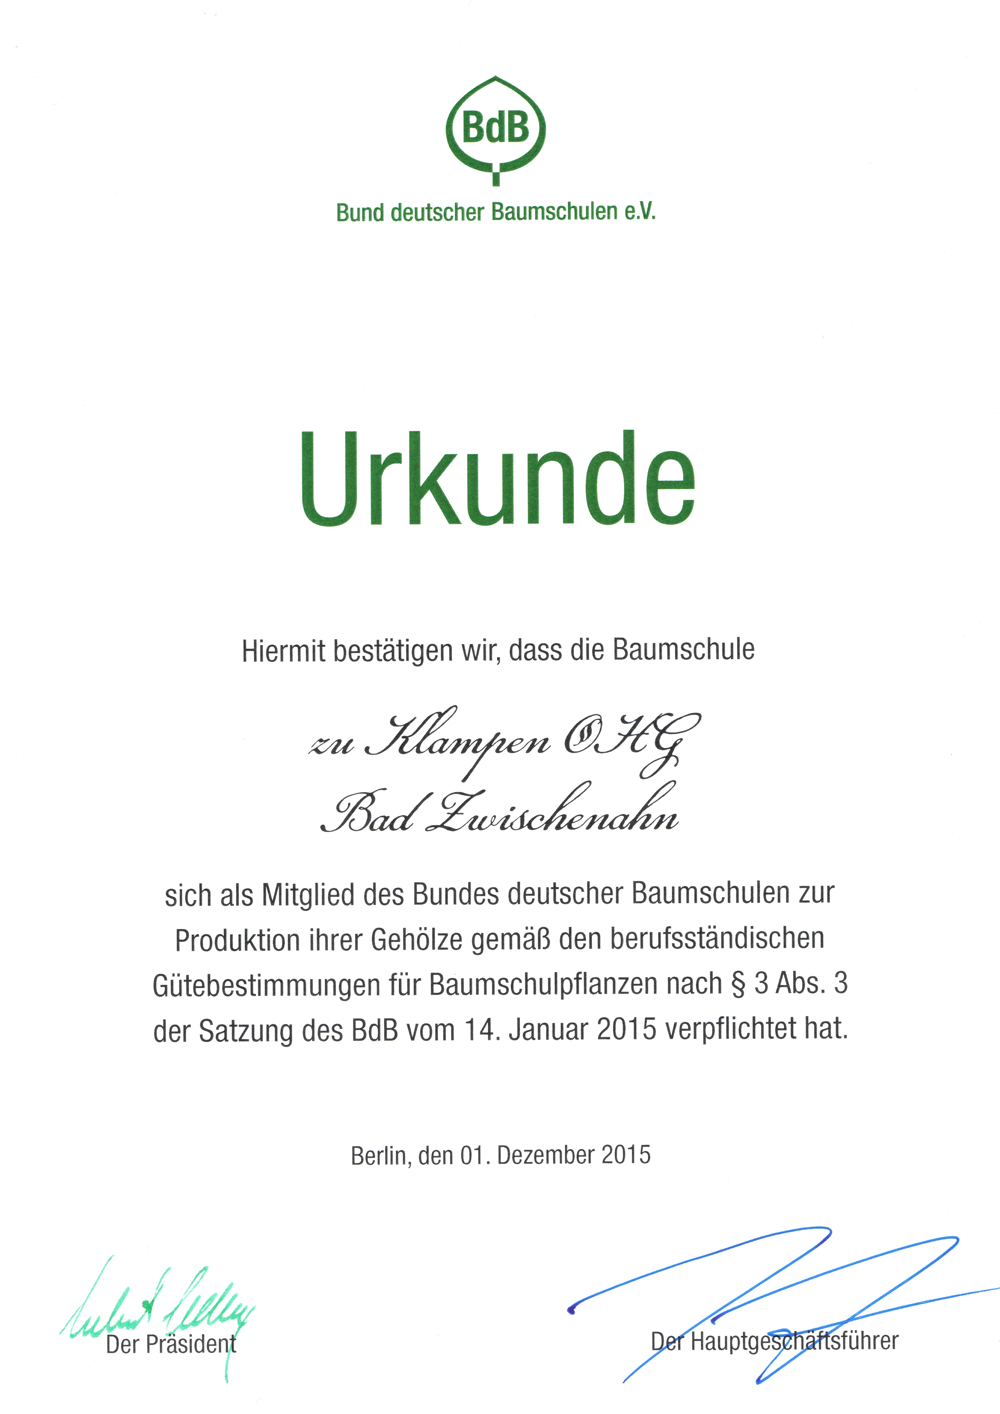 BdB-Urkunde-GartenHit24.de